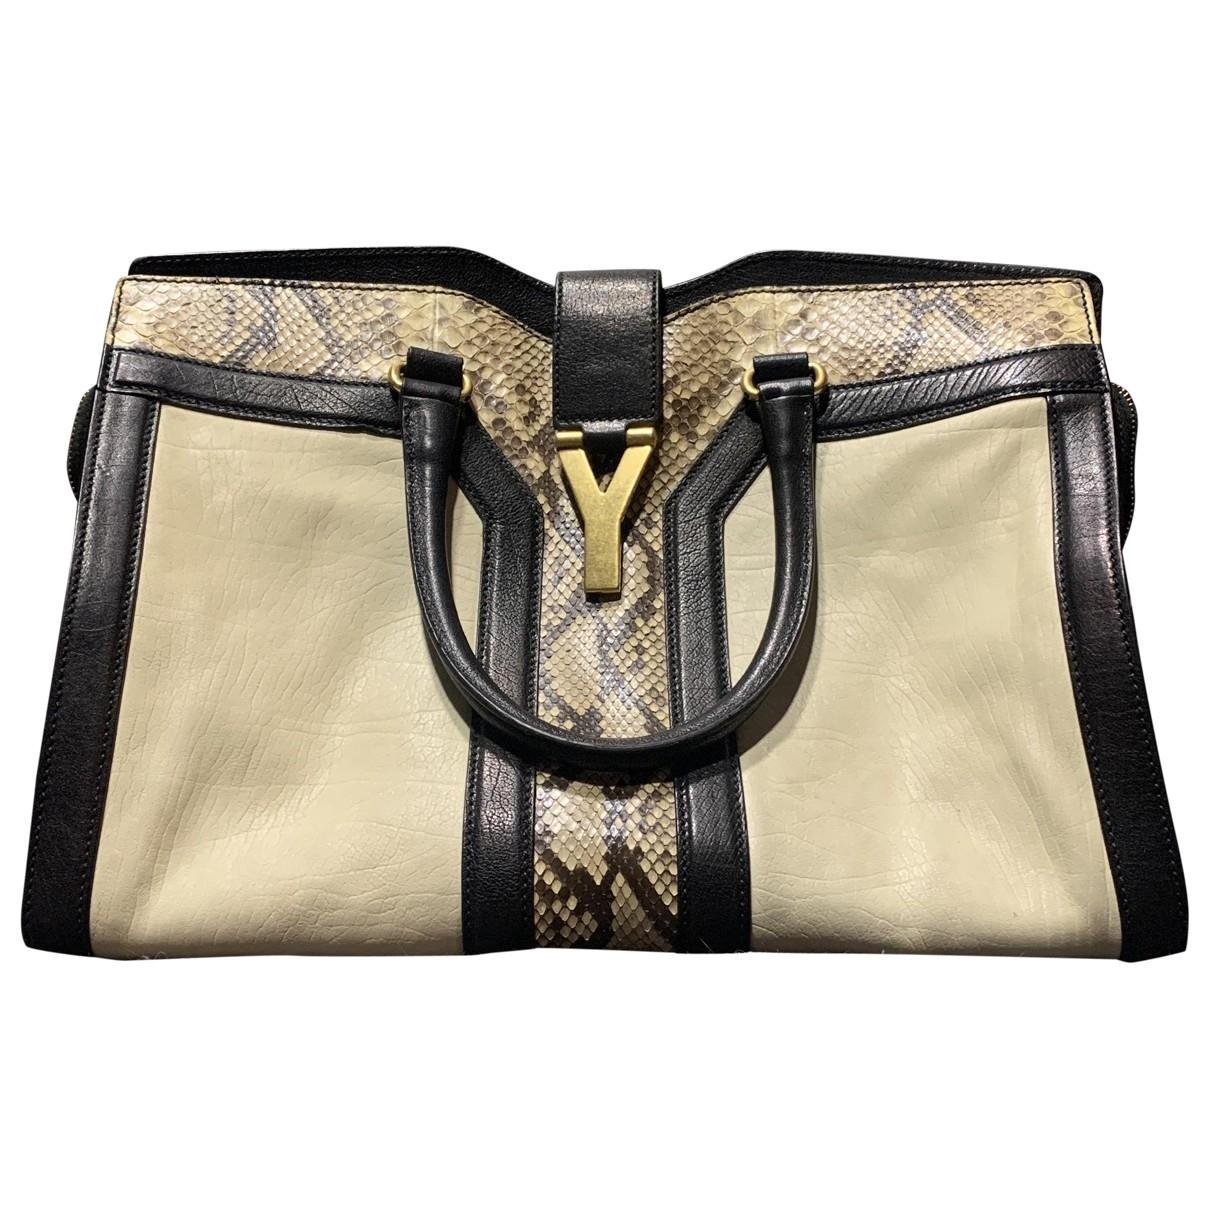 Yves Saint Laurent Chyc Beige Python handbag for Women \N